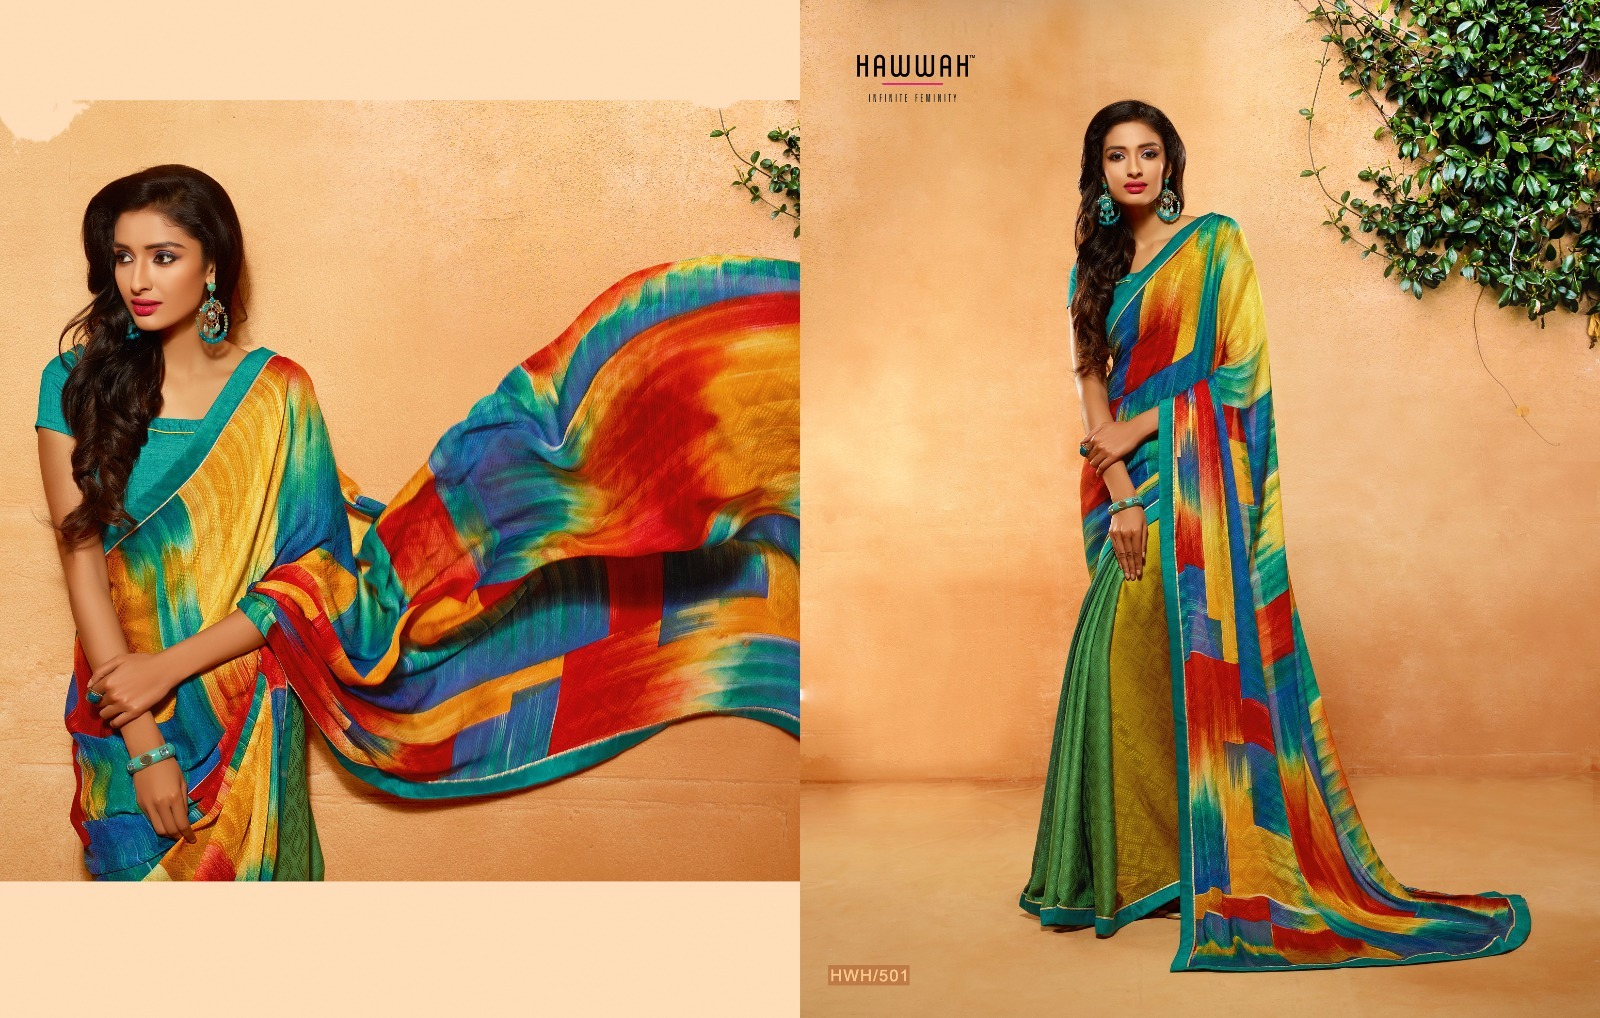 Hawwah – Printed Saree With Lace Border